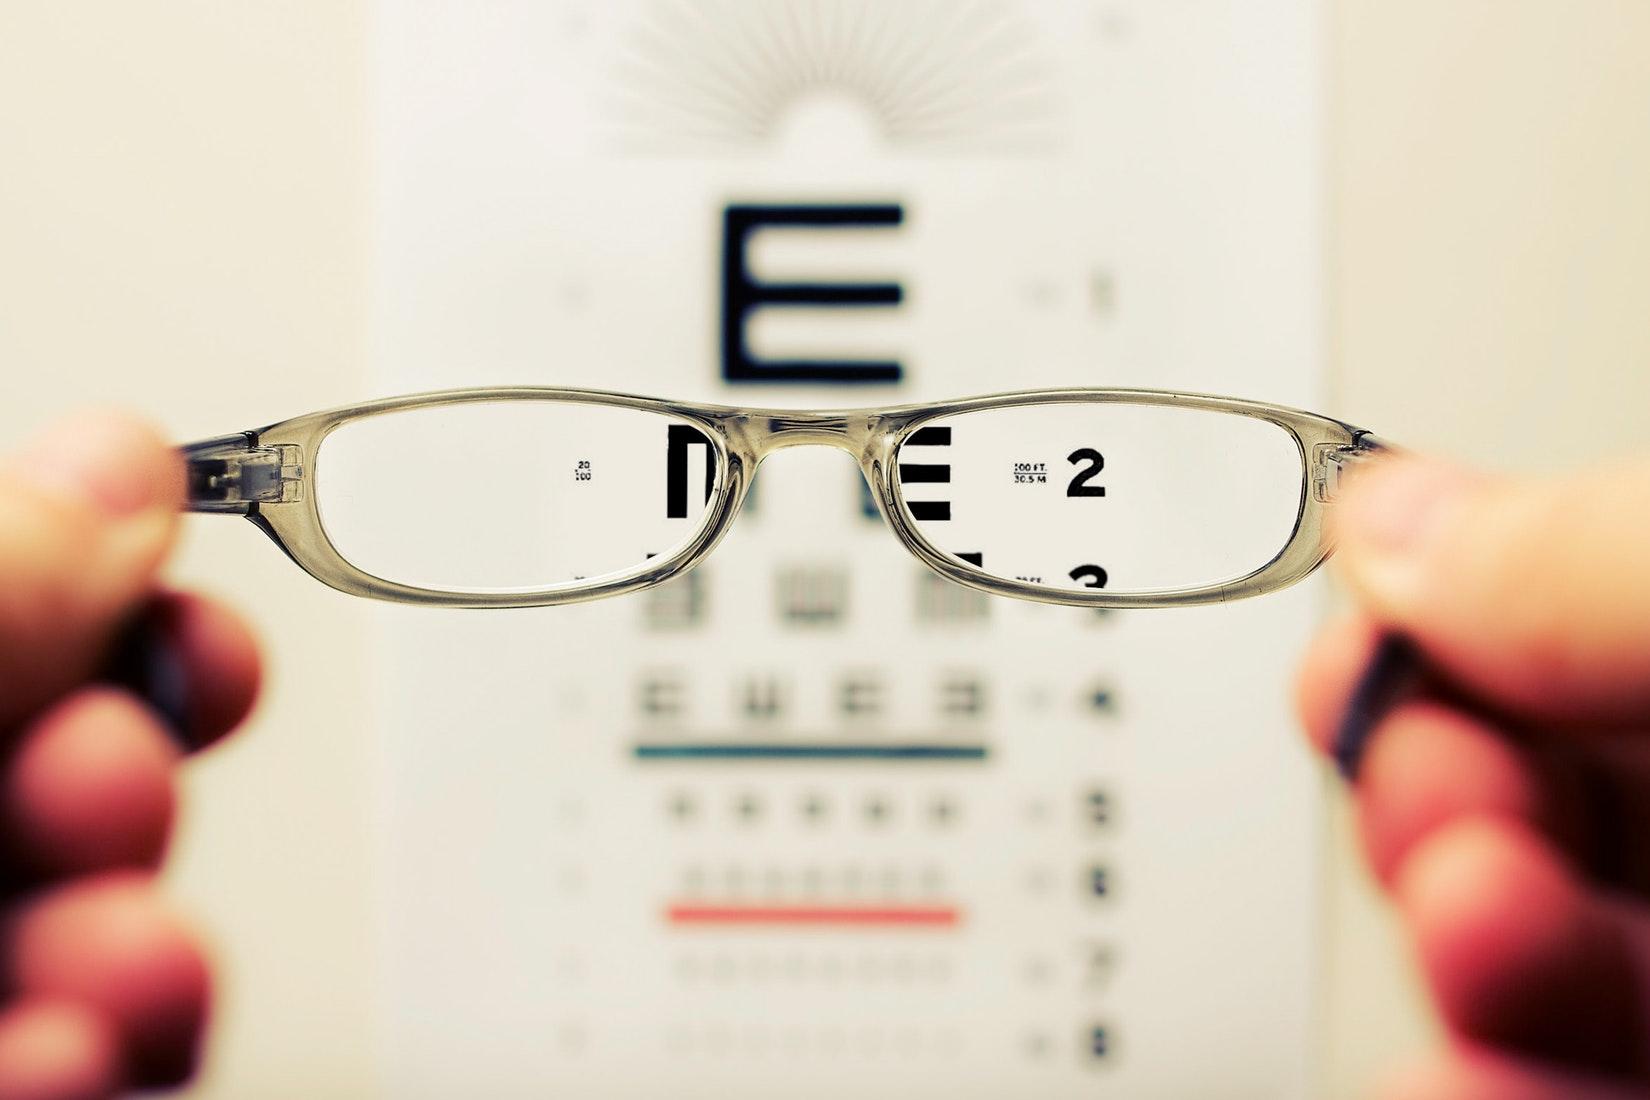 Get your eyesight checked regularly.